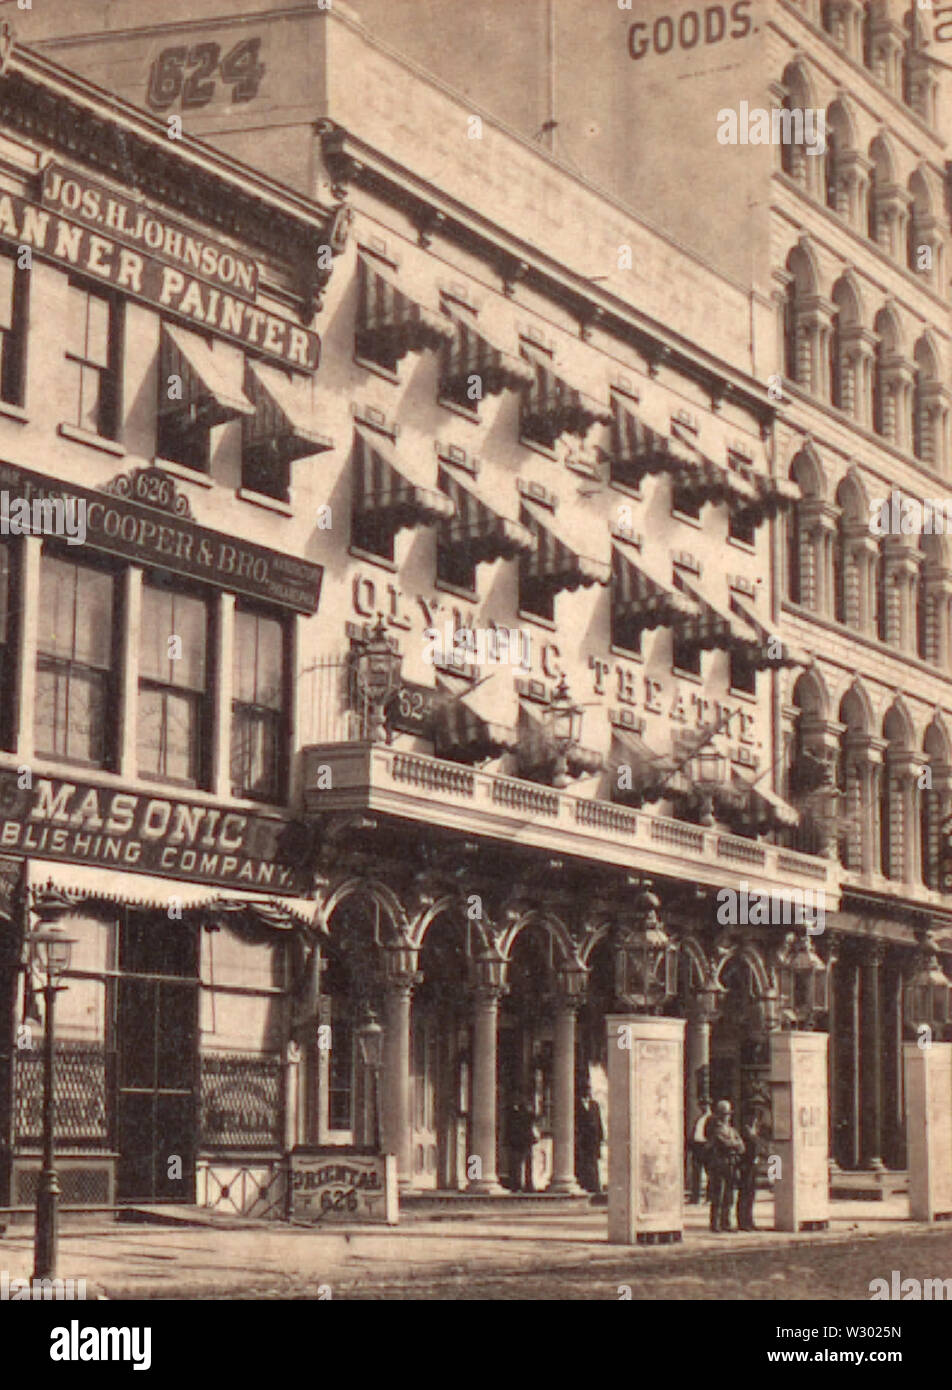 Olympic Theatre, 624 Broadway, New York (demolished) - Stock Image